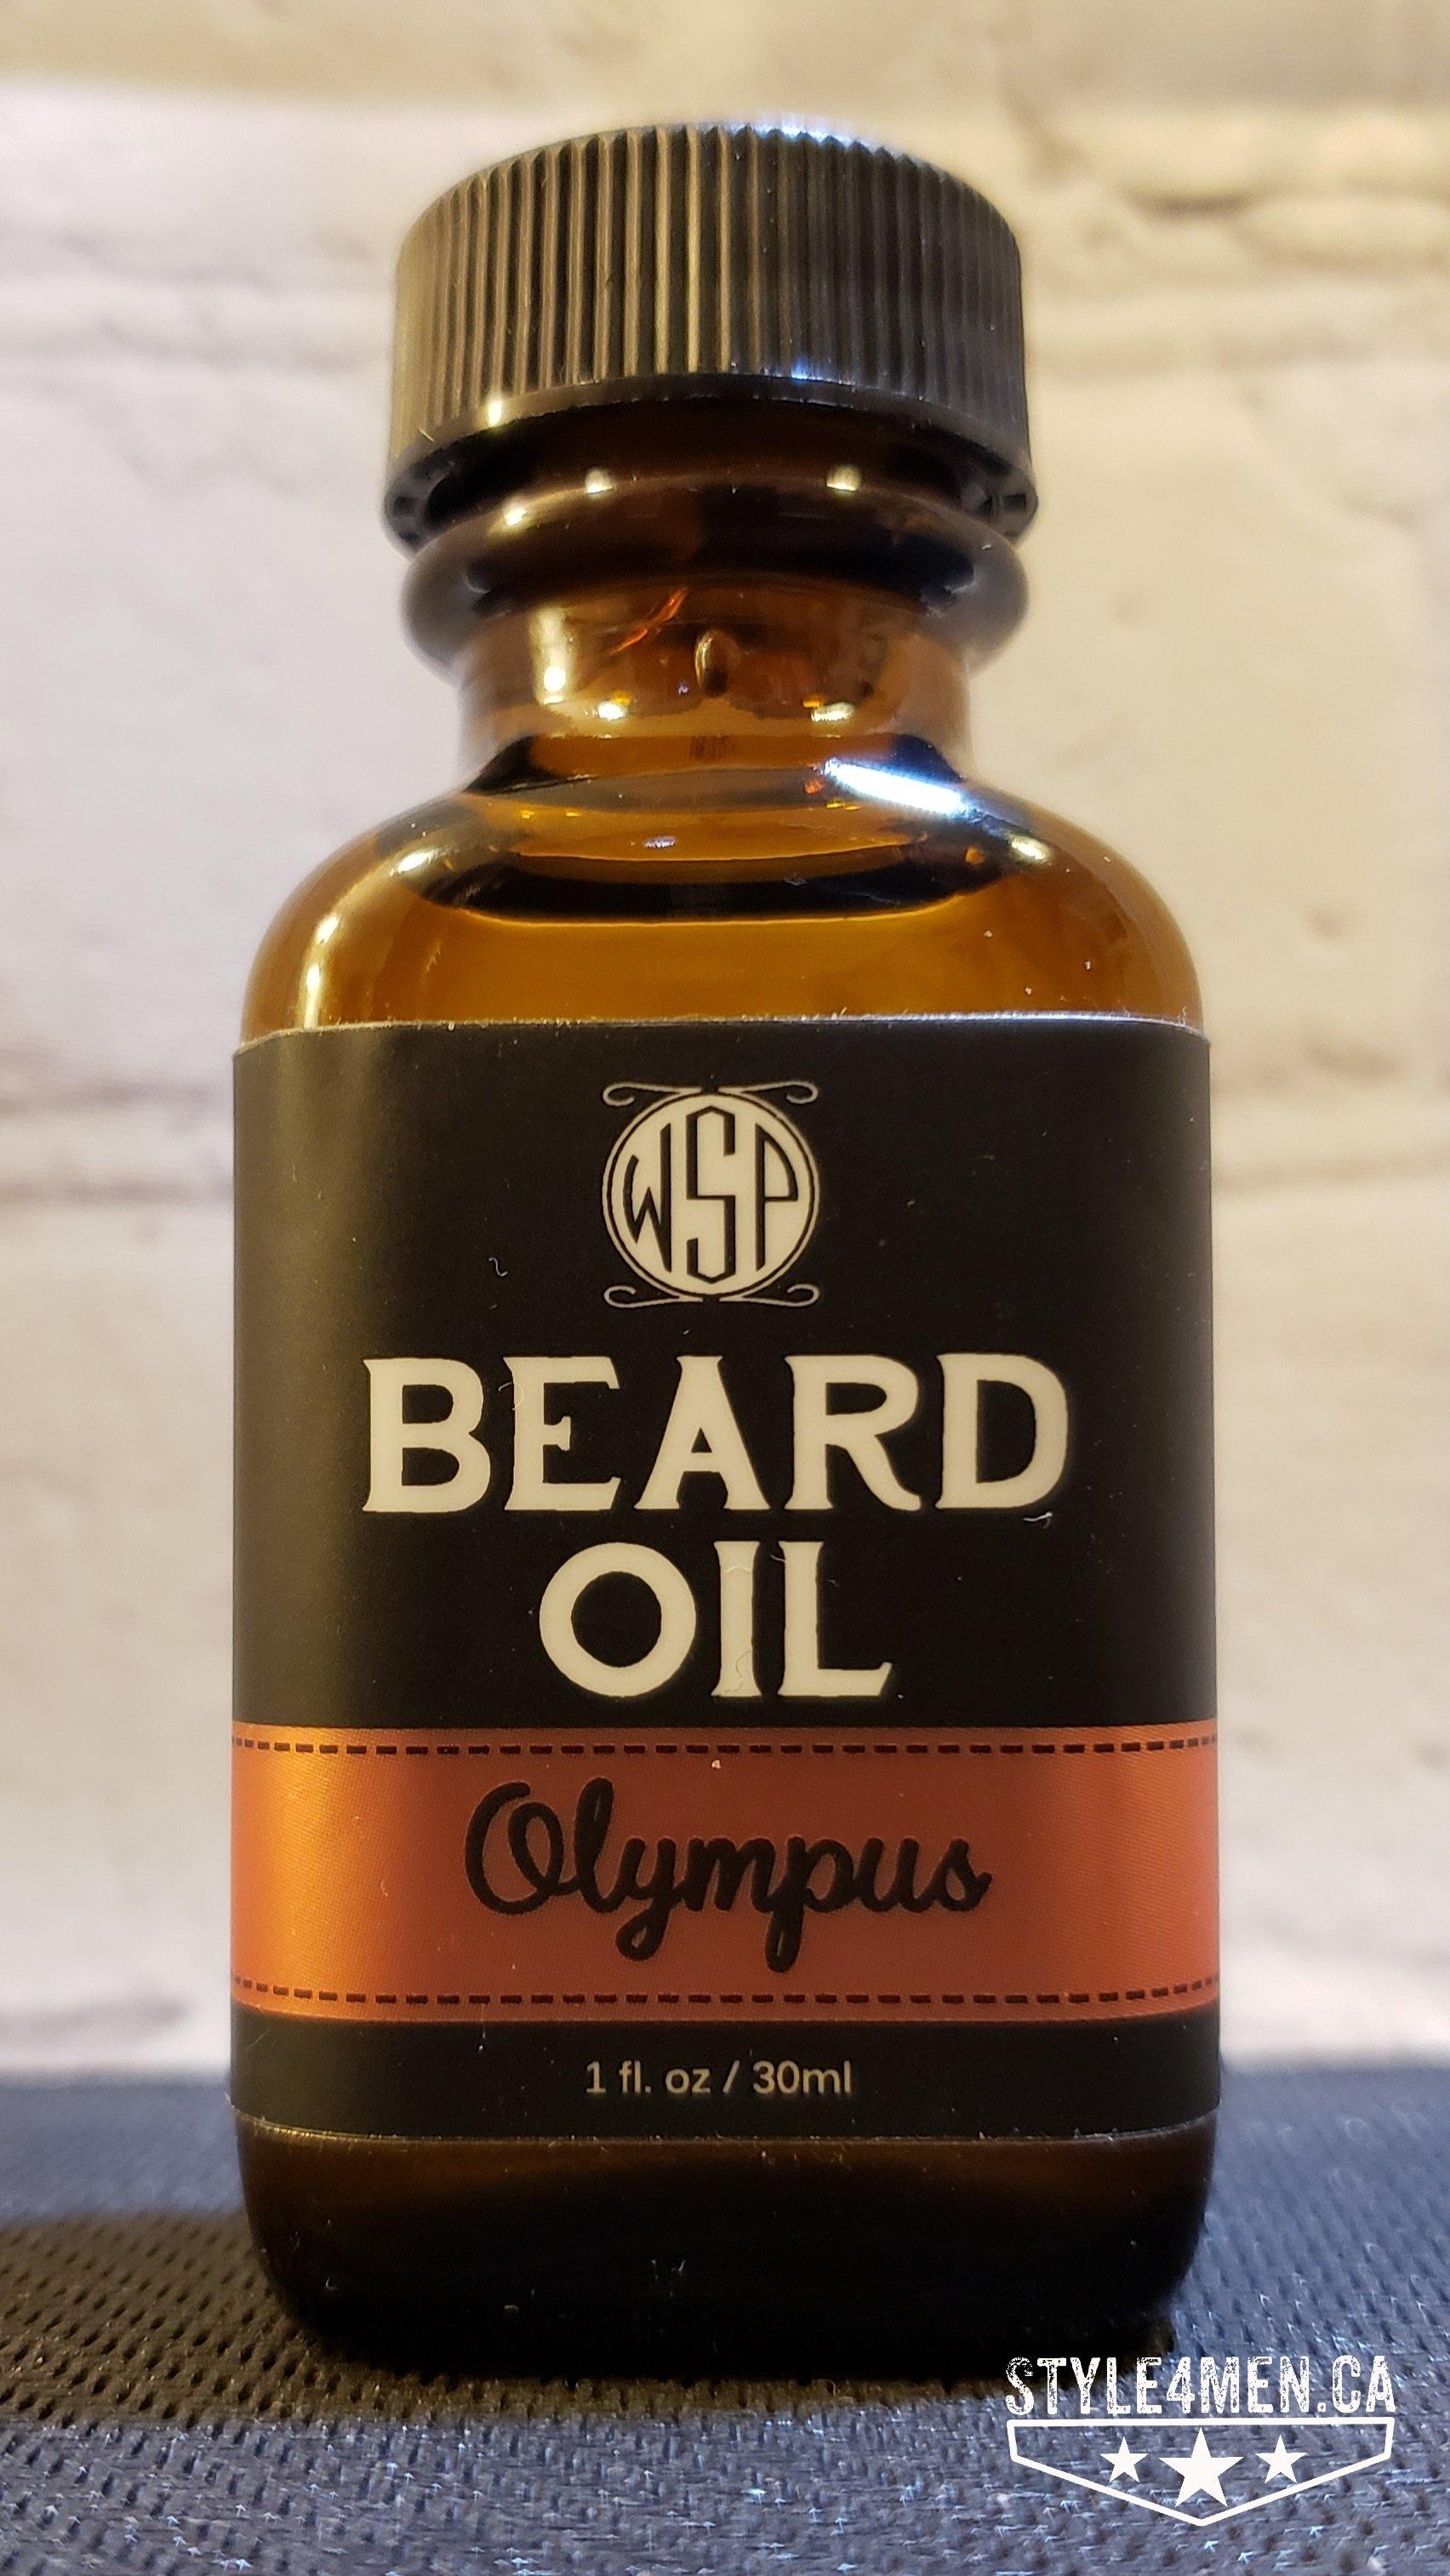 WSP Beard Oil